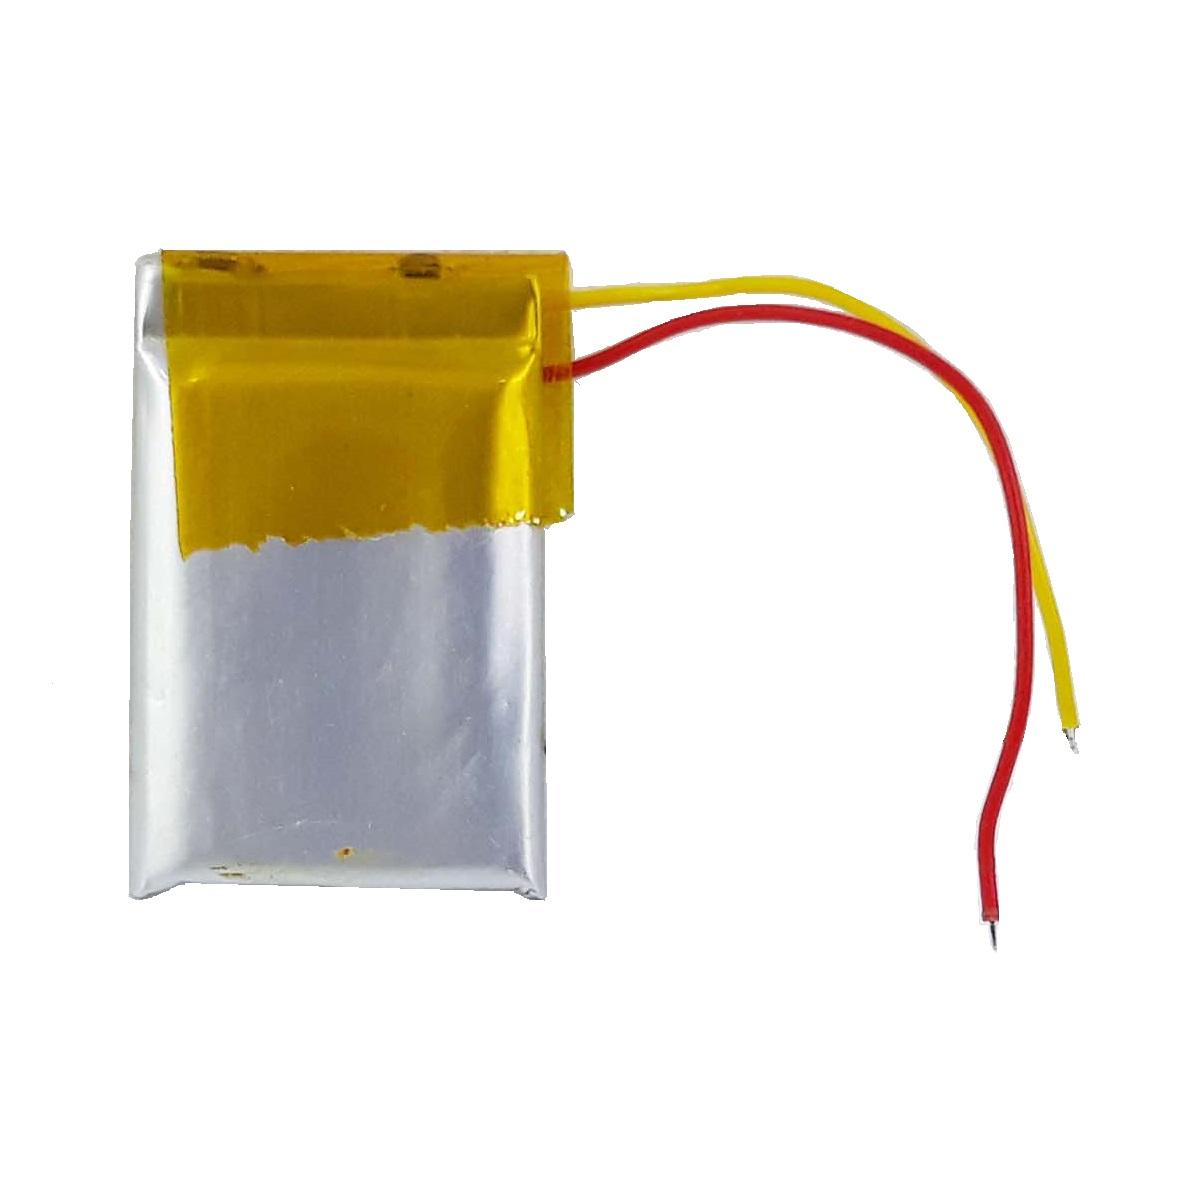 باتری لیتیوم یون قابل شارژ مدل Head-01 ظرفیت200میلی آمپر ساعت